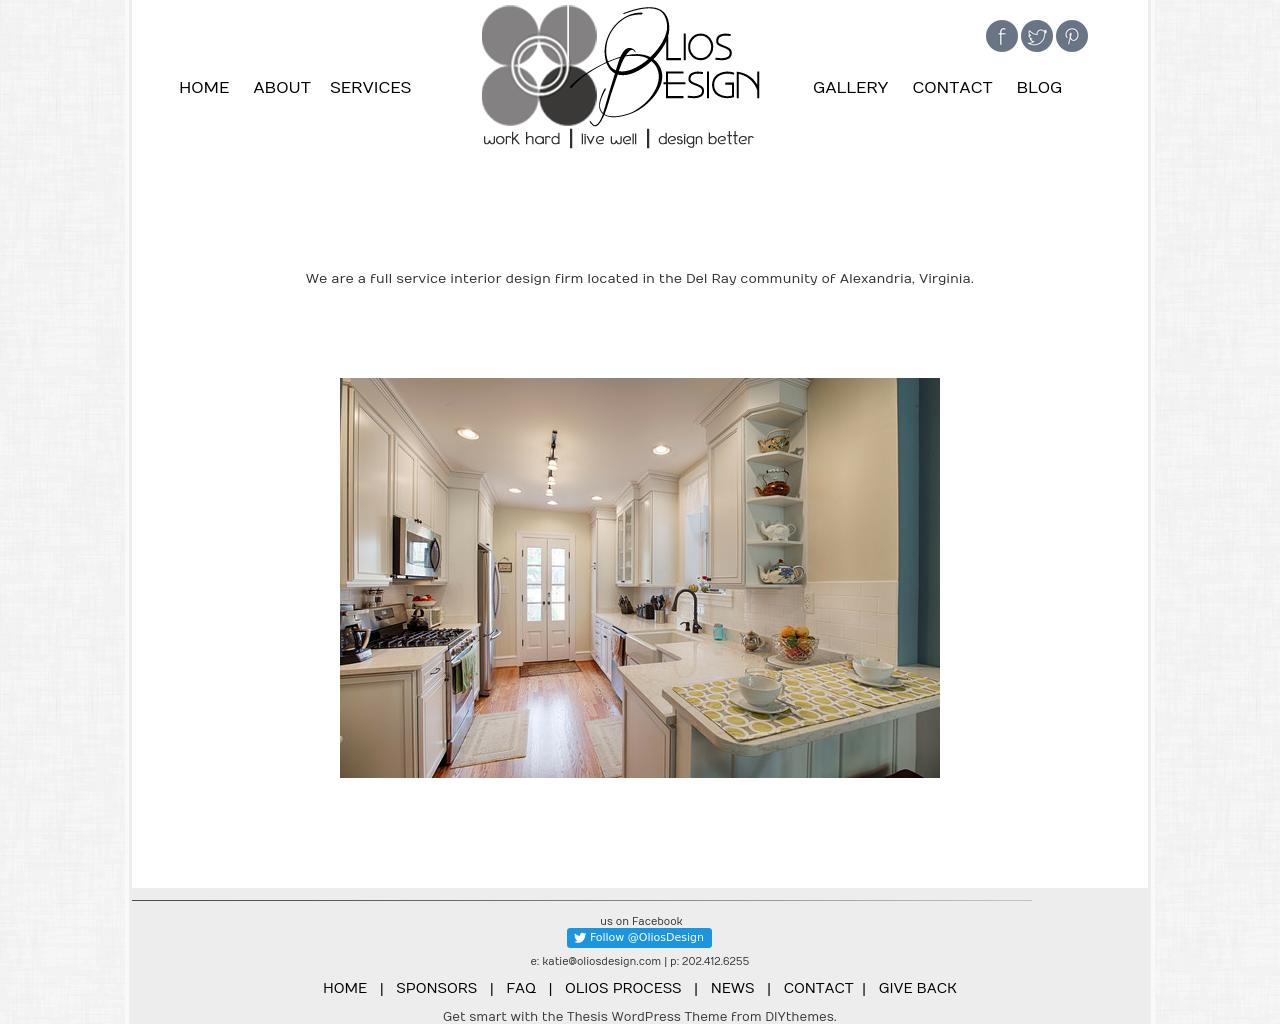 Olios-Design-Advertising-Reviews-Pricing